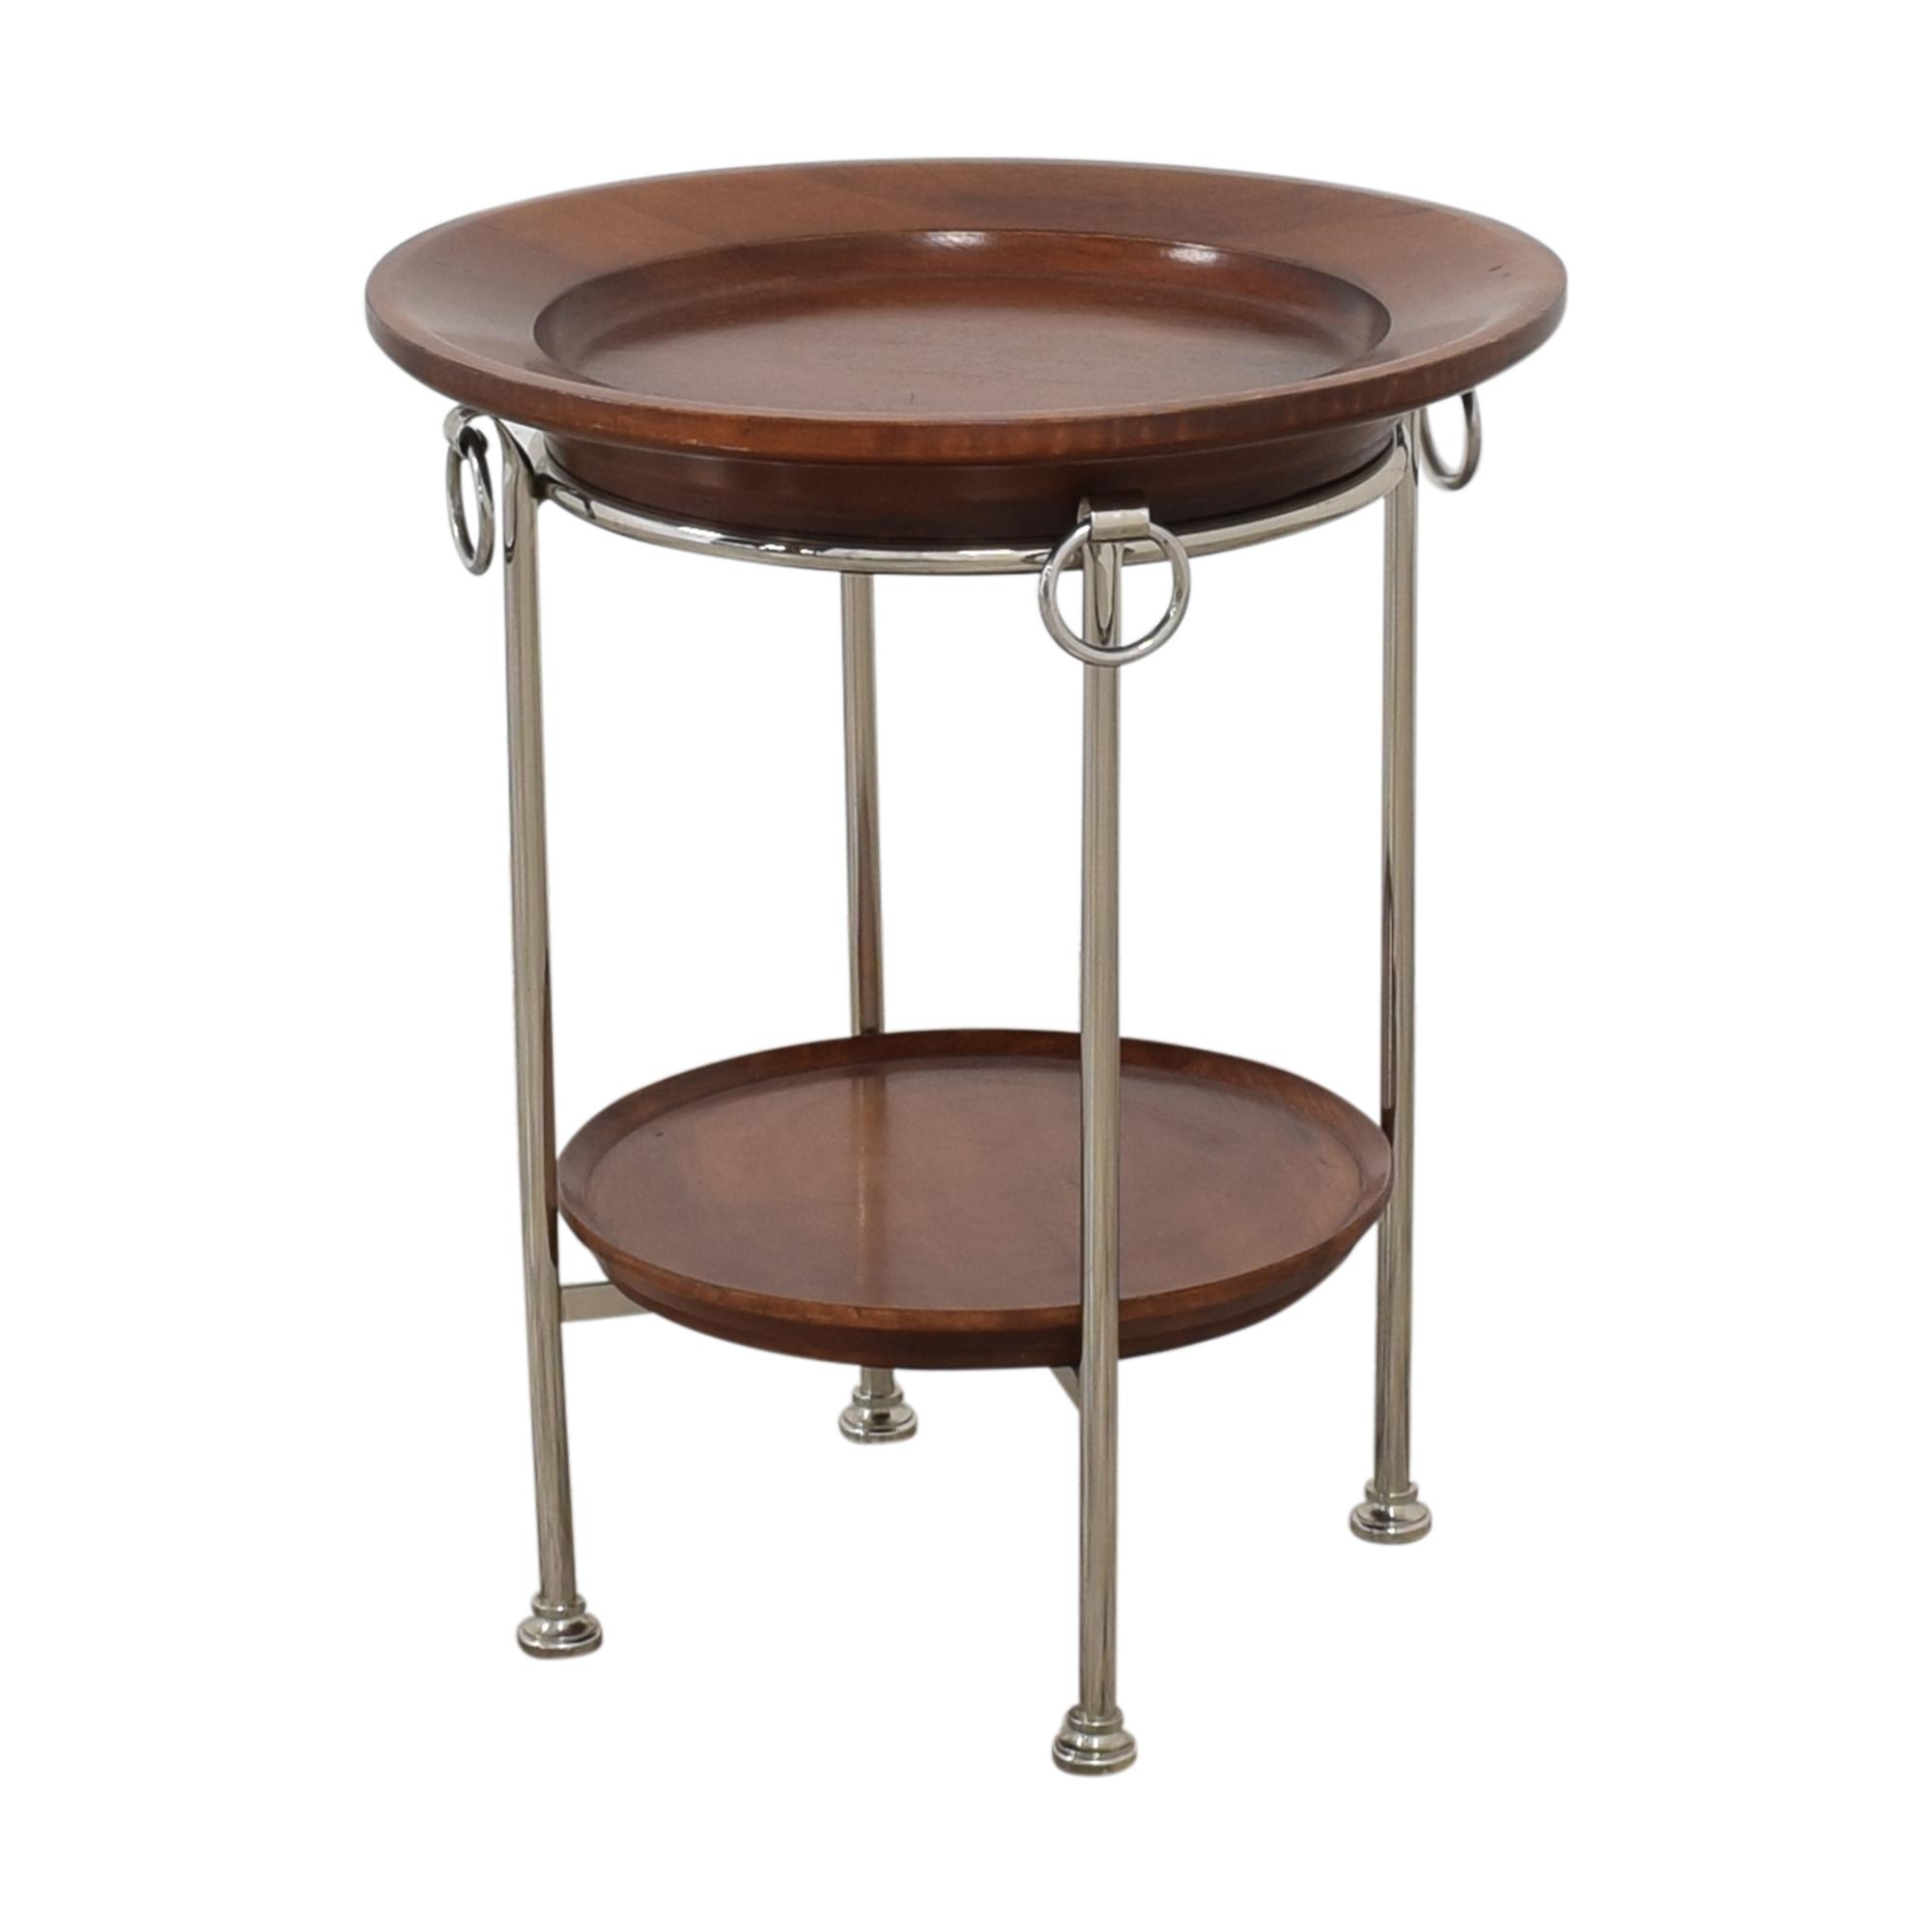 Ralph Lauren Home Ralph Lauren Home Wooden Cocktail Table Tables